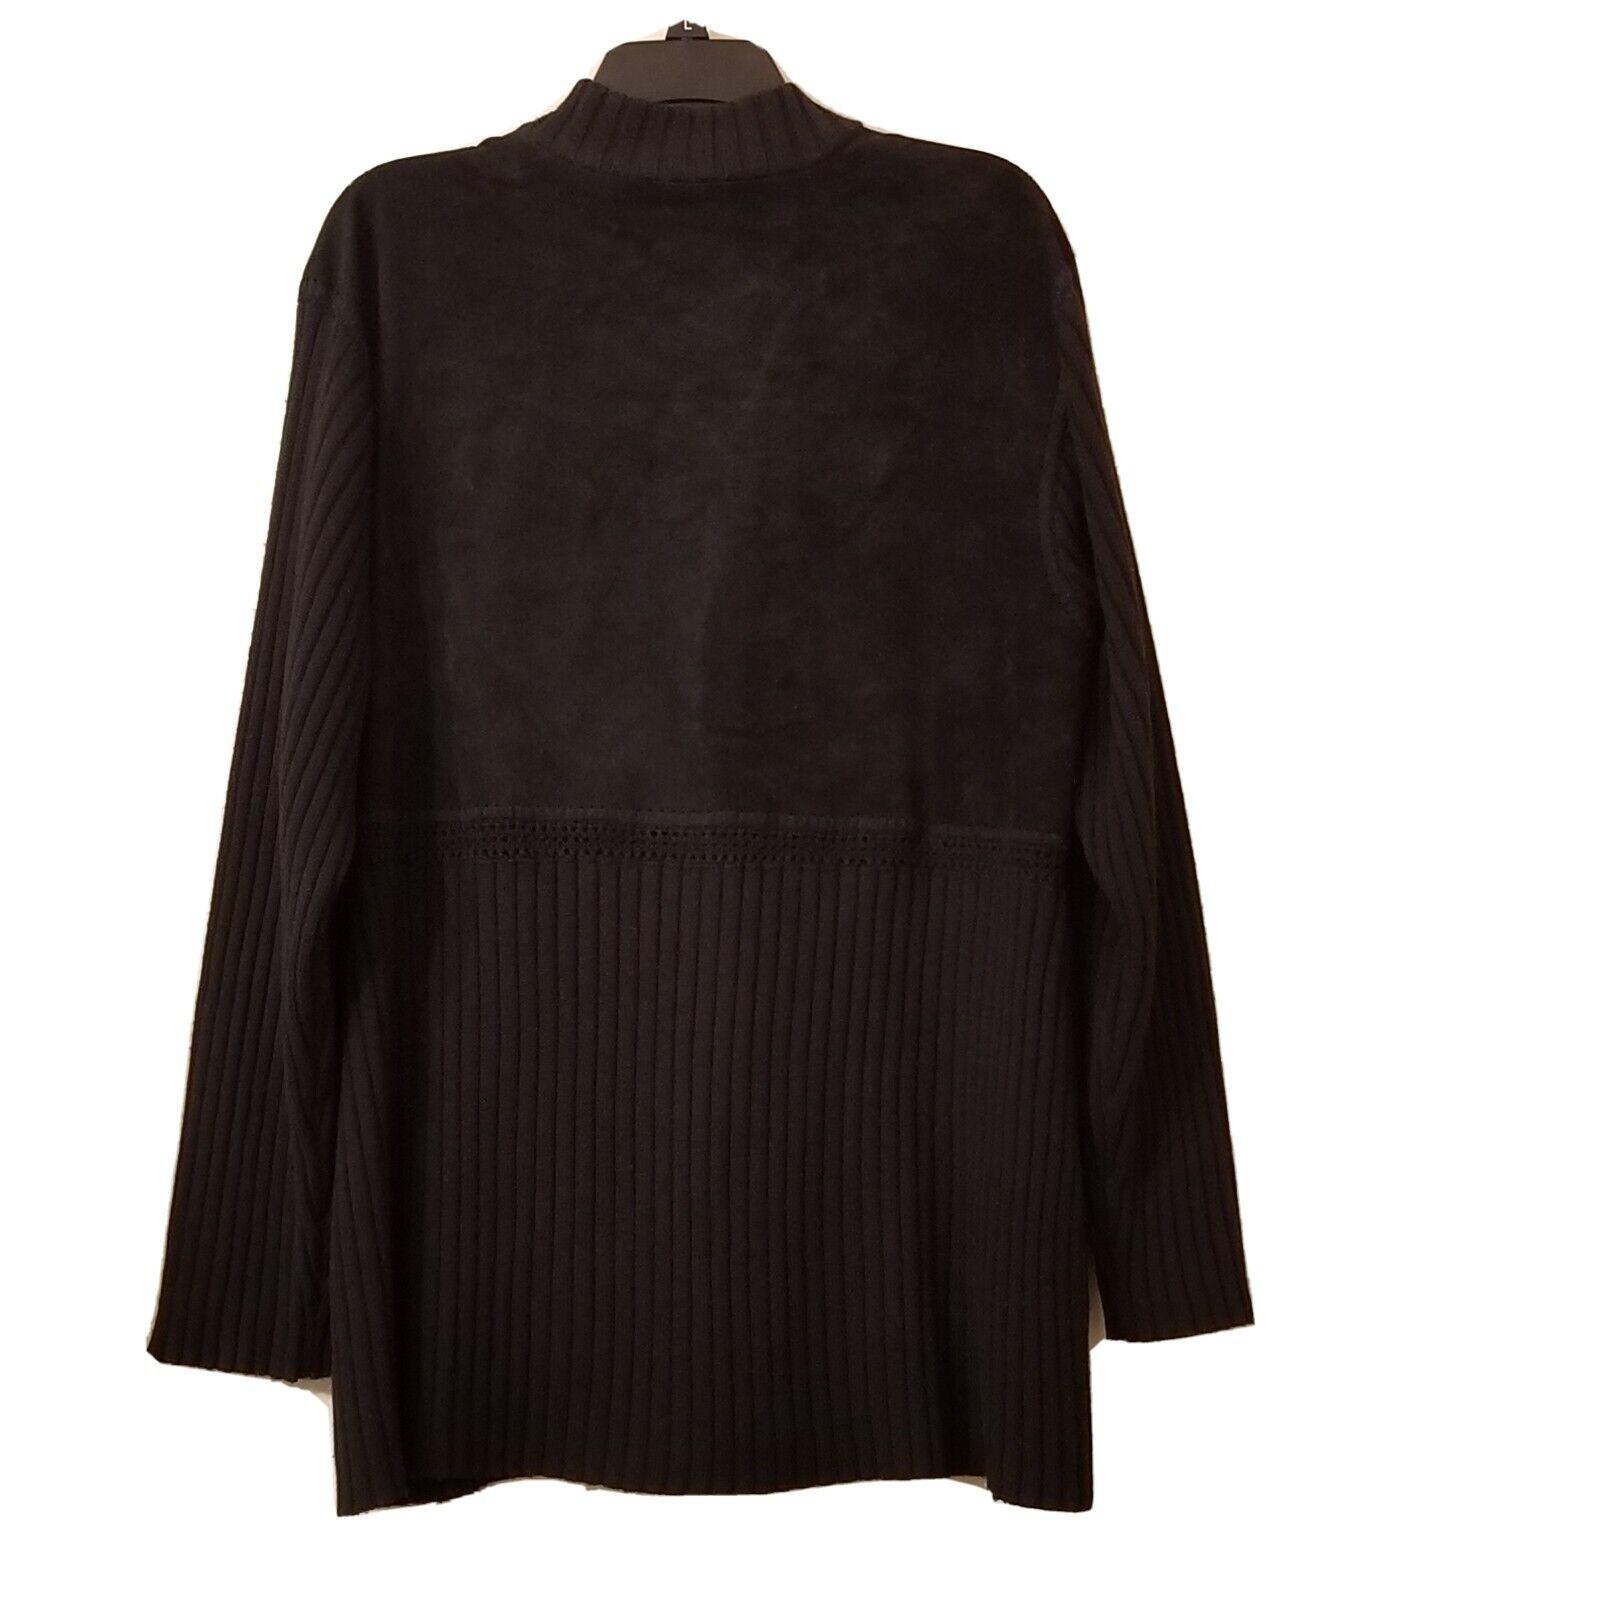 J Jill Cardigan  Wool/suede Leather Blend Woven L… - image 5